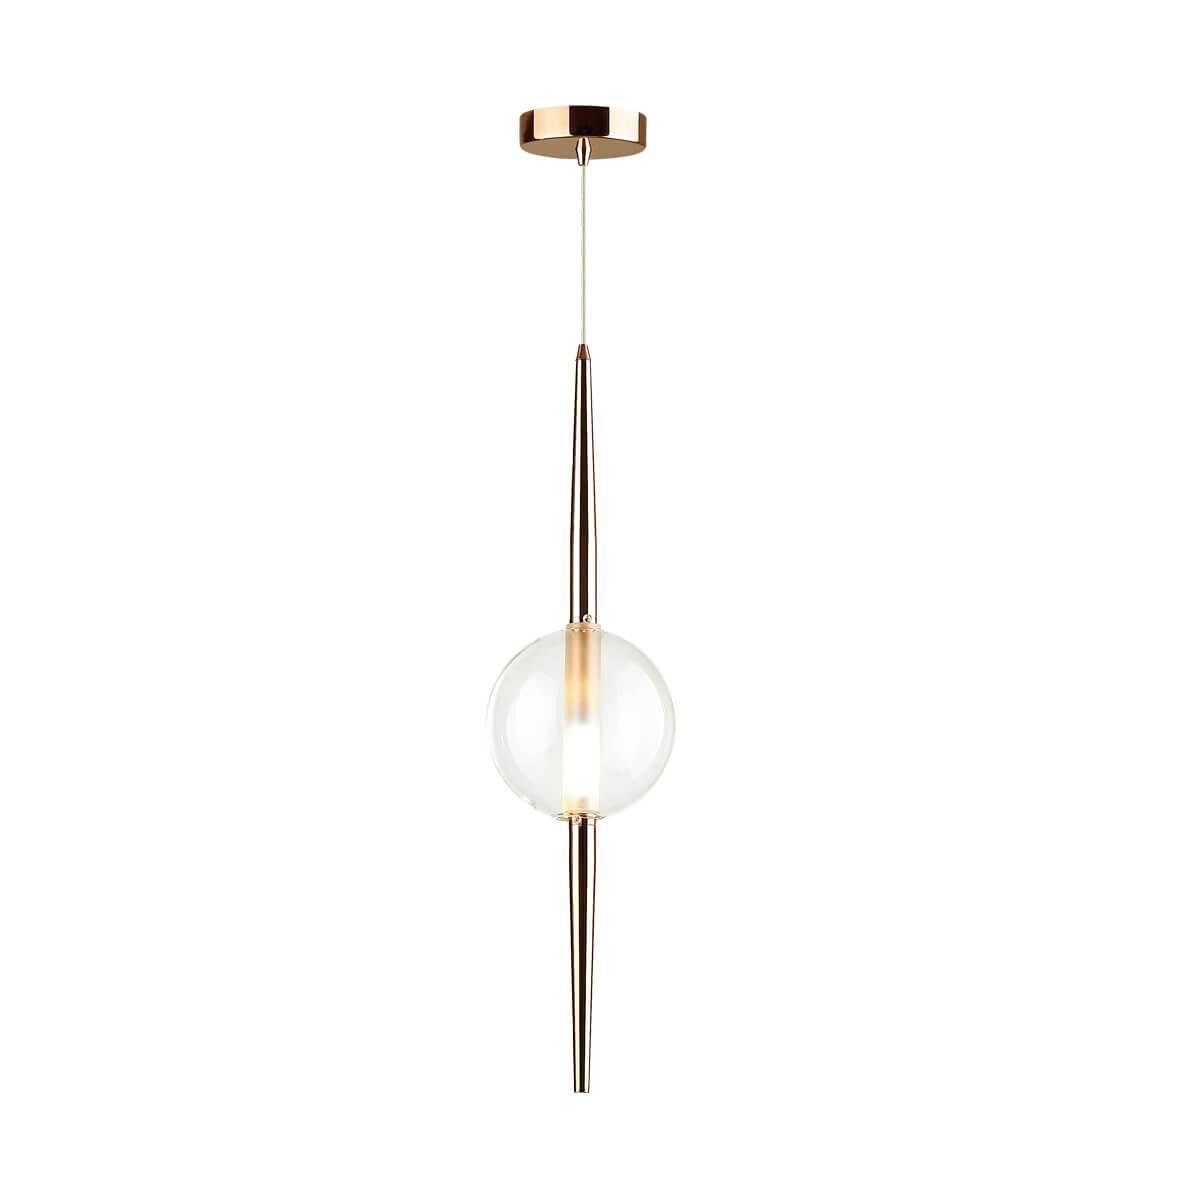 Светильник Odeon Light 4685/1 Pendant